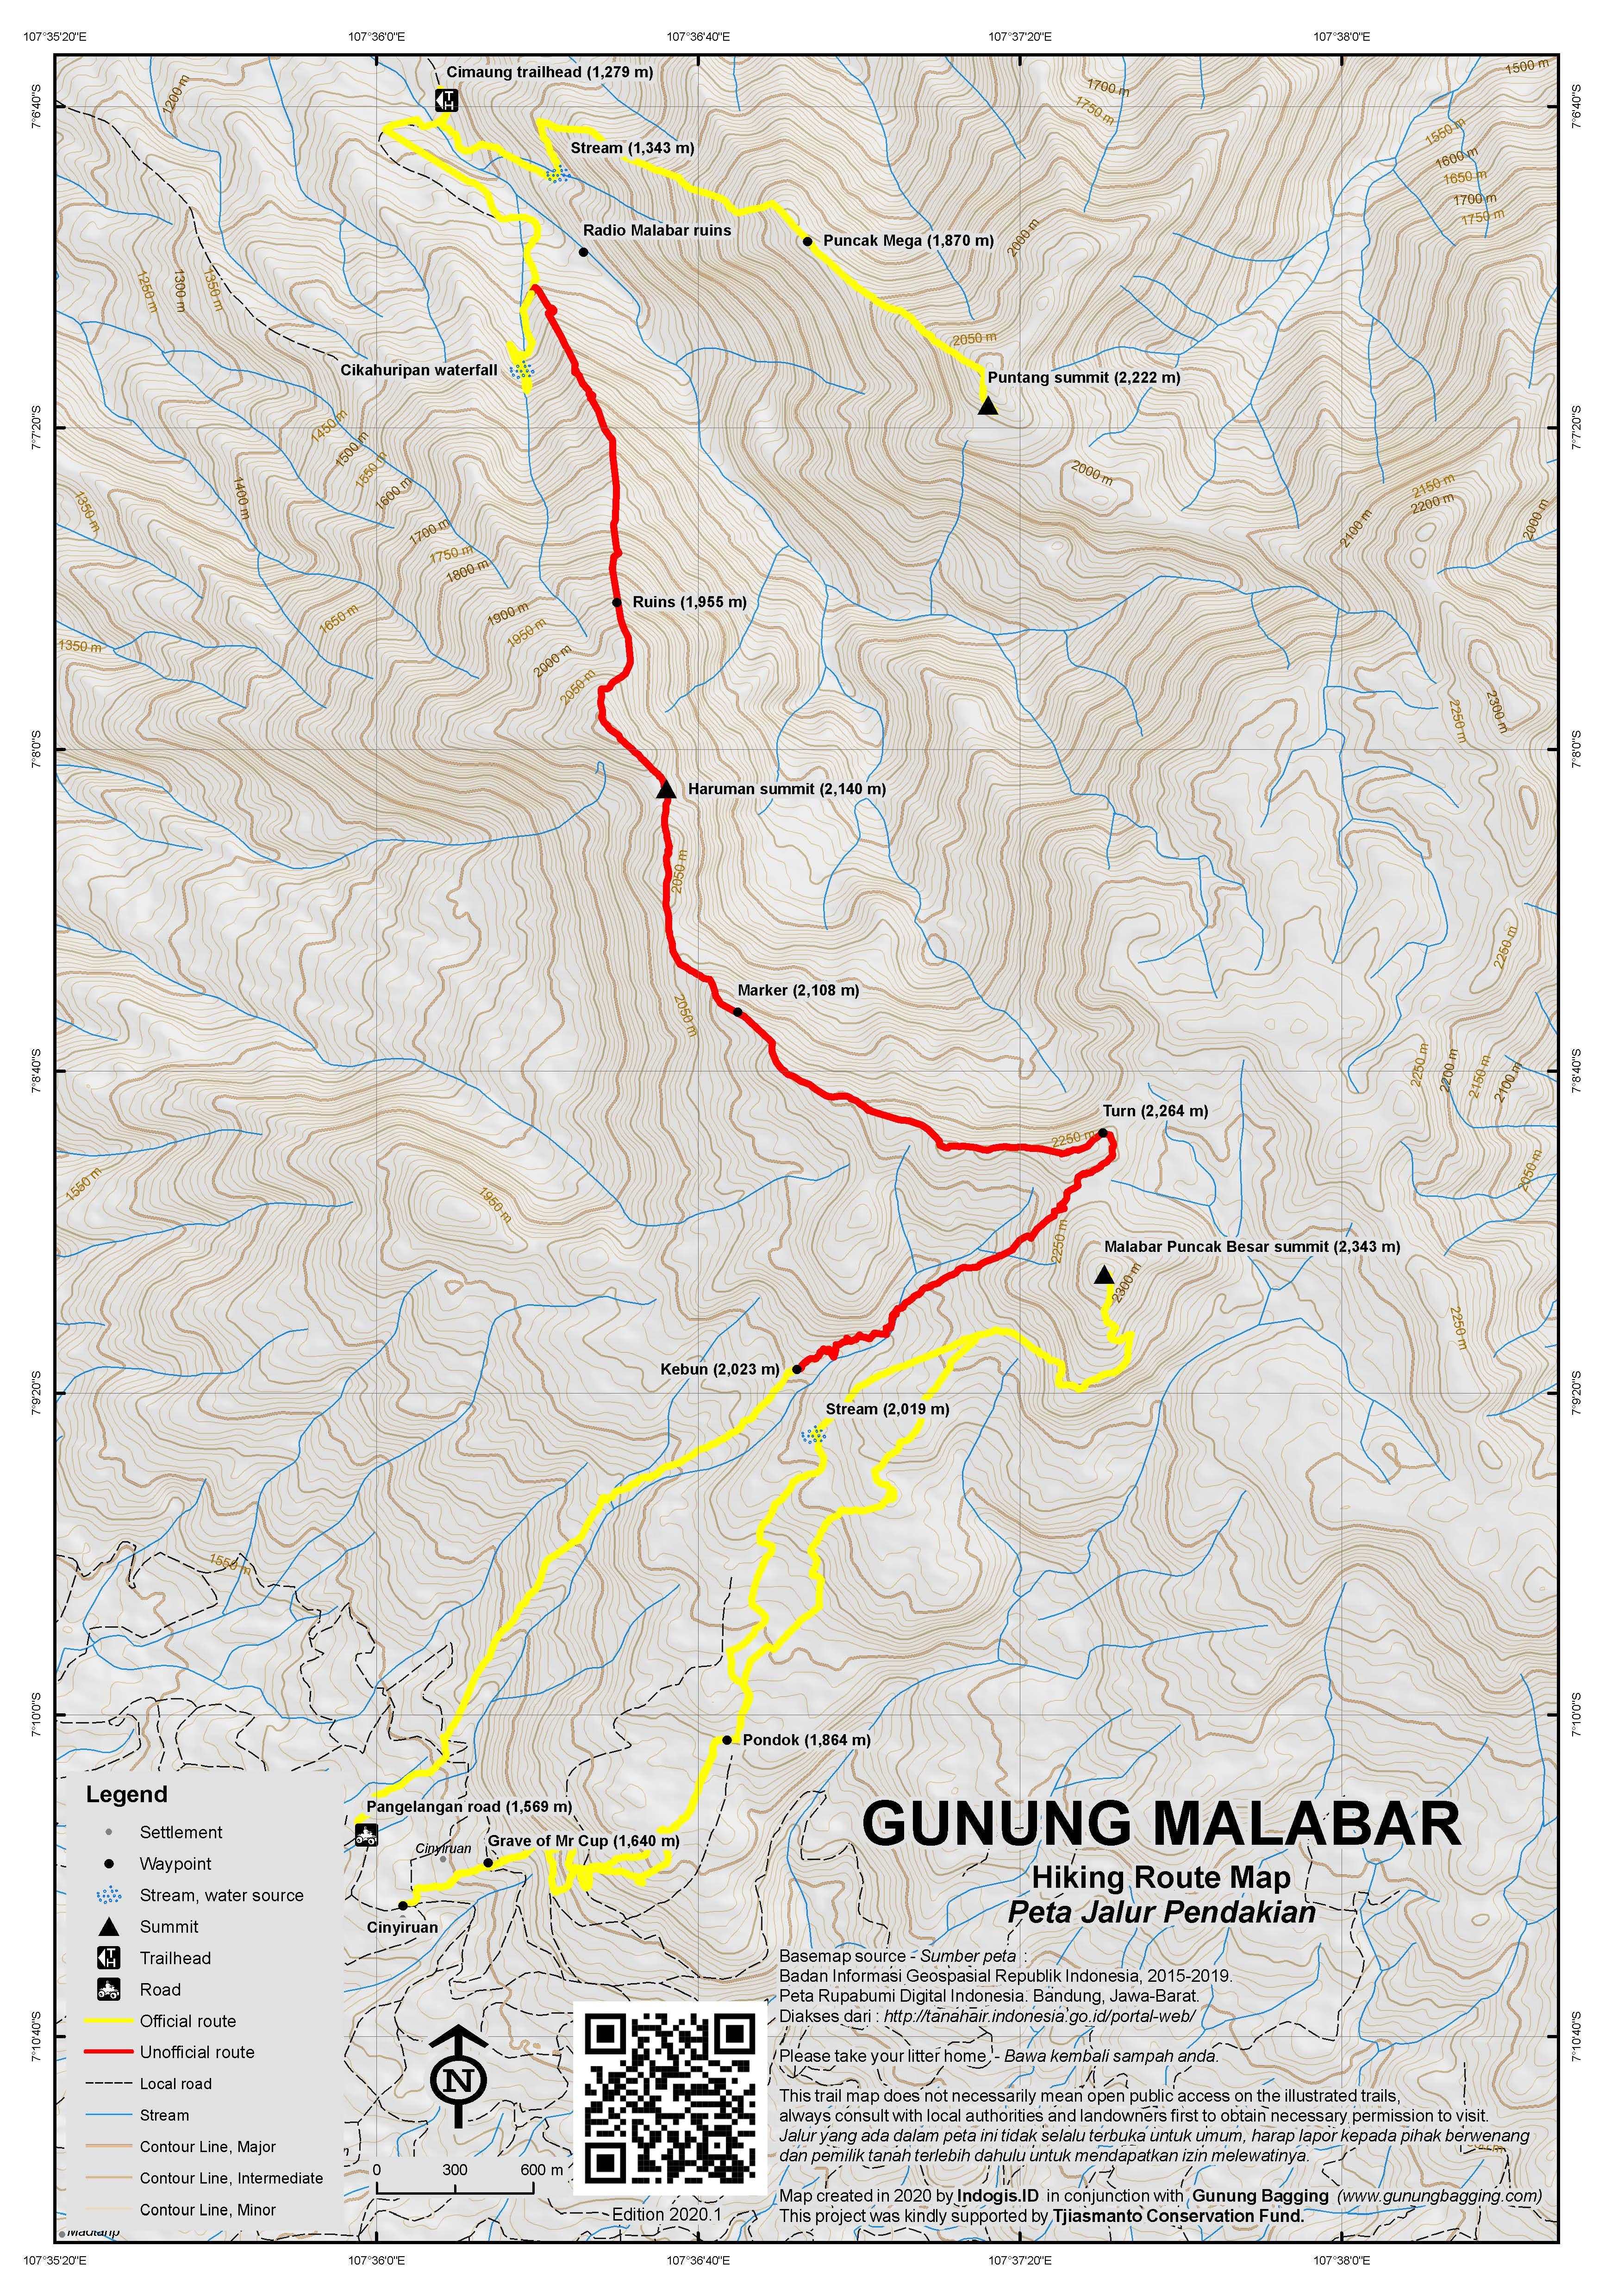 Peta Jalur Pendakian Gunung Malabar